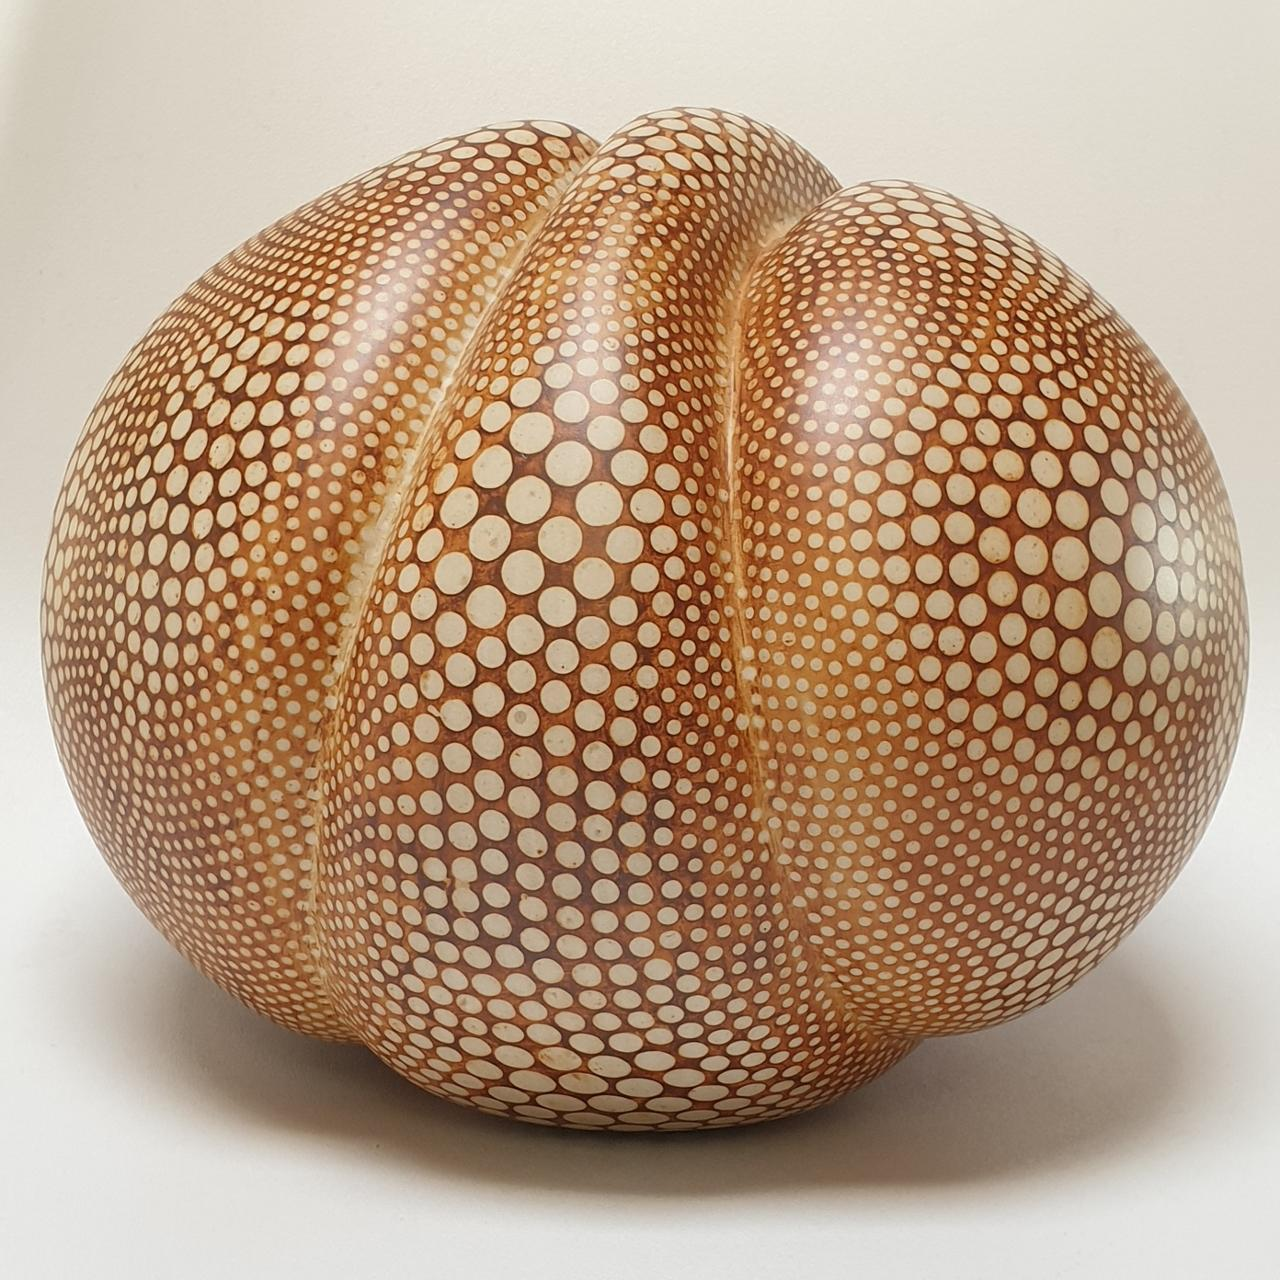 Kokon gepunktet - contemporary modern abstract organic ceramic sculpture object